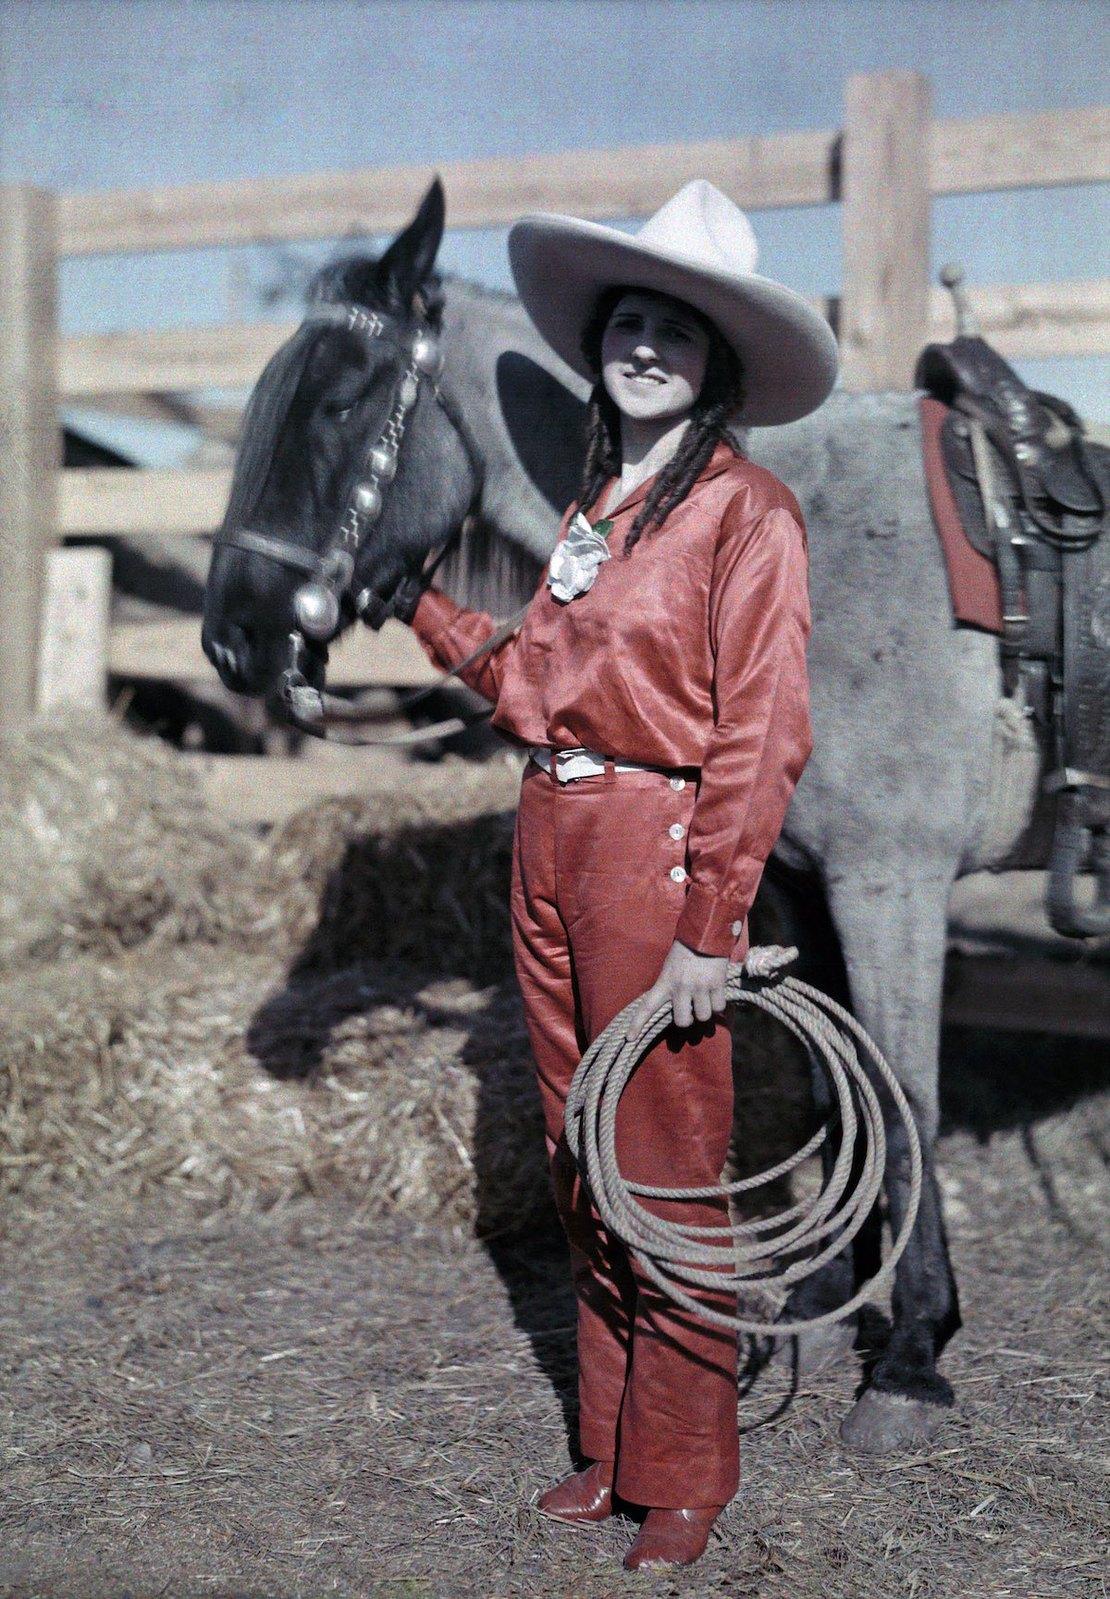 1928. Сан-Антонио, штат Техас – наездница позирует со своим пони на родео. Клифтон Р. Адамс